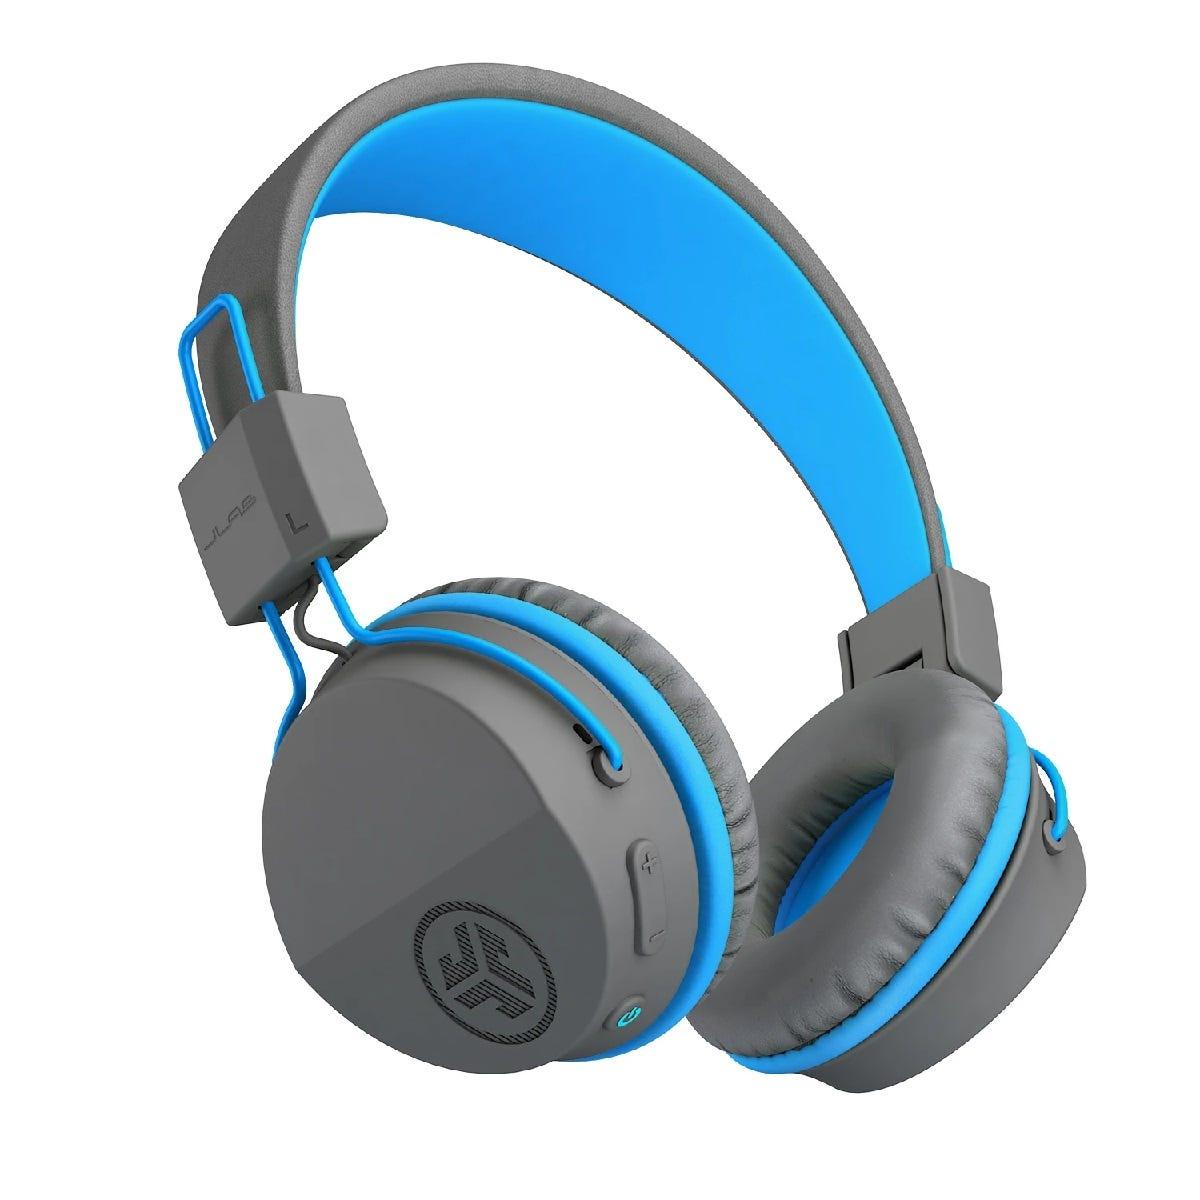 JLab JBuddies Studio Wireless Over Ear Kids Foldable Headphones - Grey/Blue